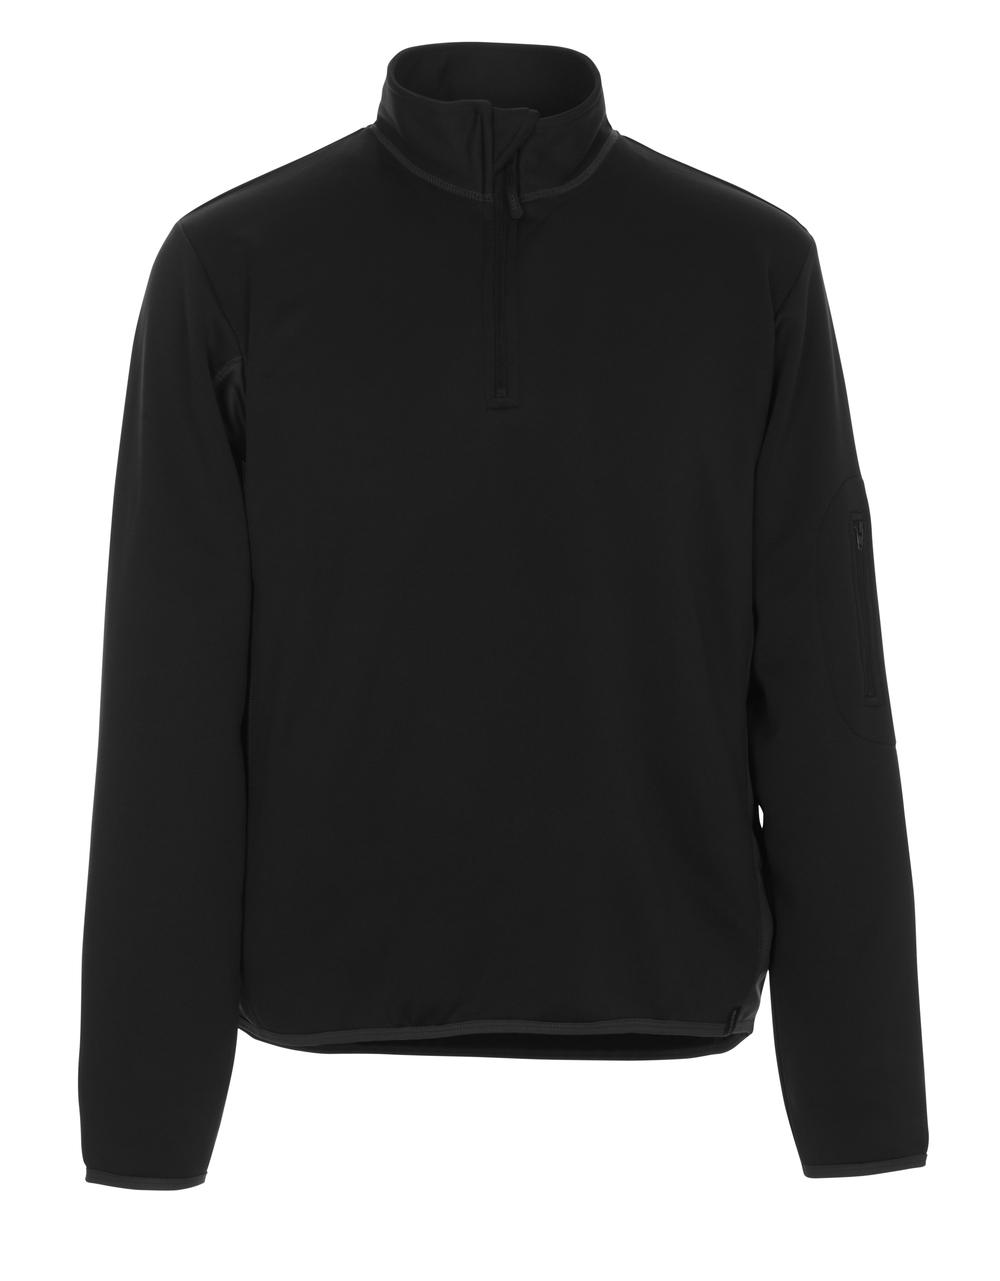 50068-828-0918 Polosweatshirt - sort/mørk antracit